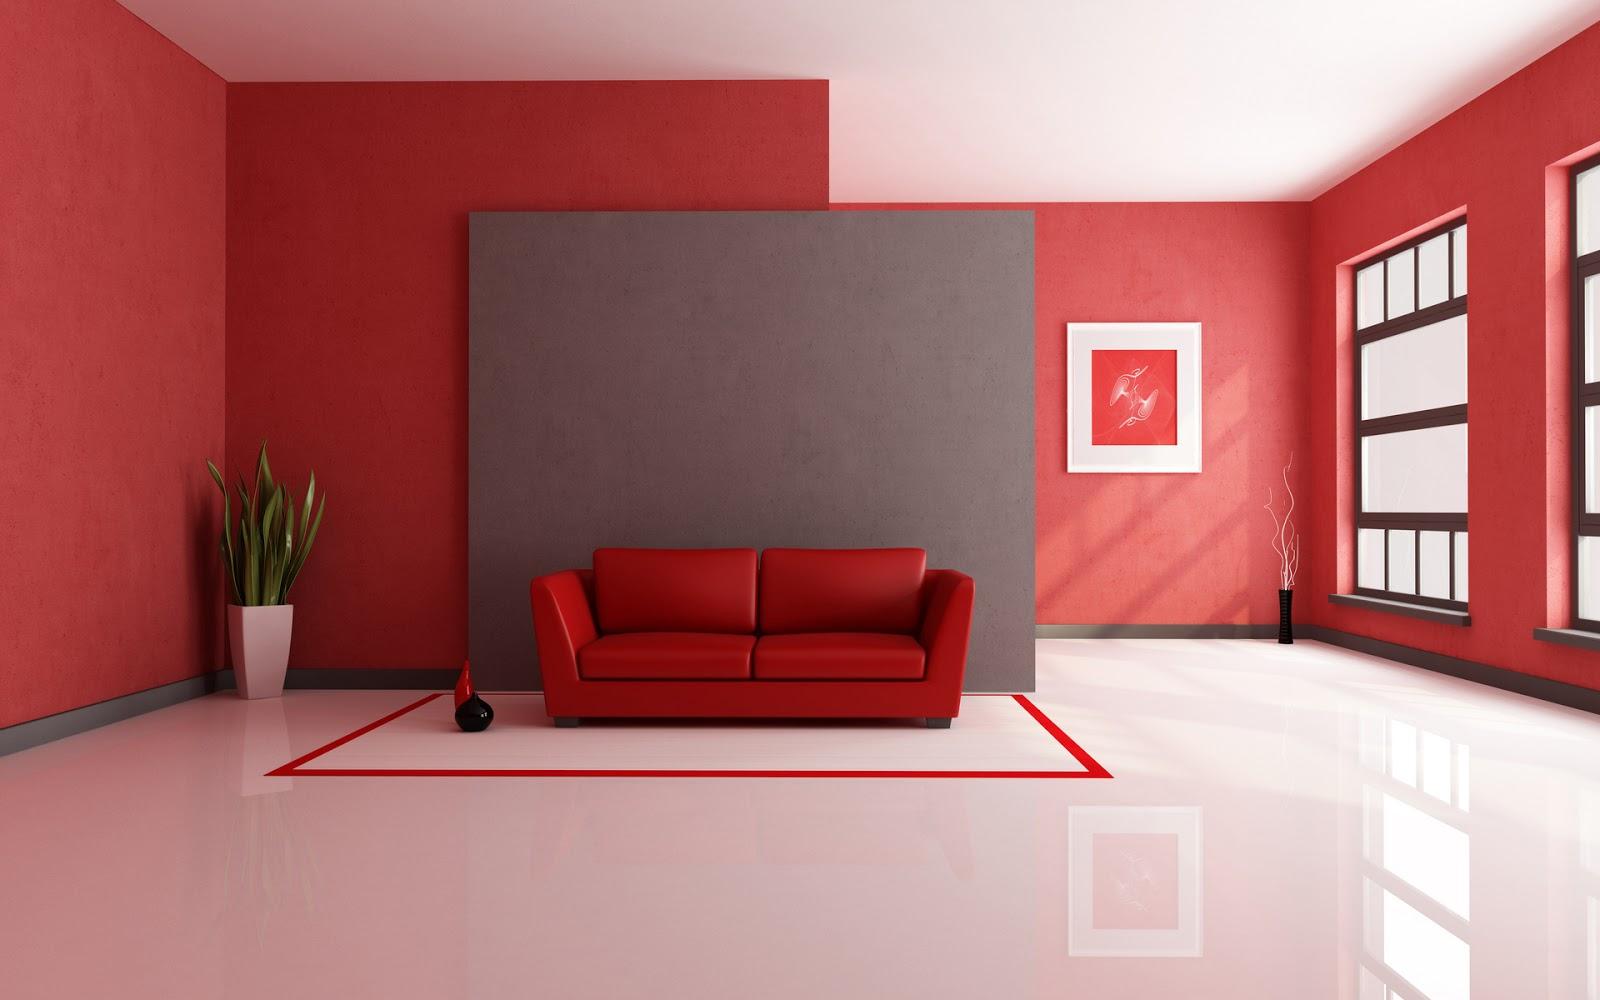 Interior design hd wallpapers - Interior design living room wallpaper ...